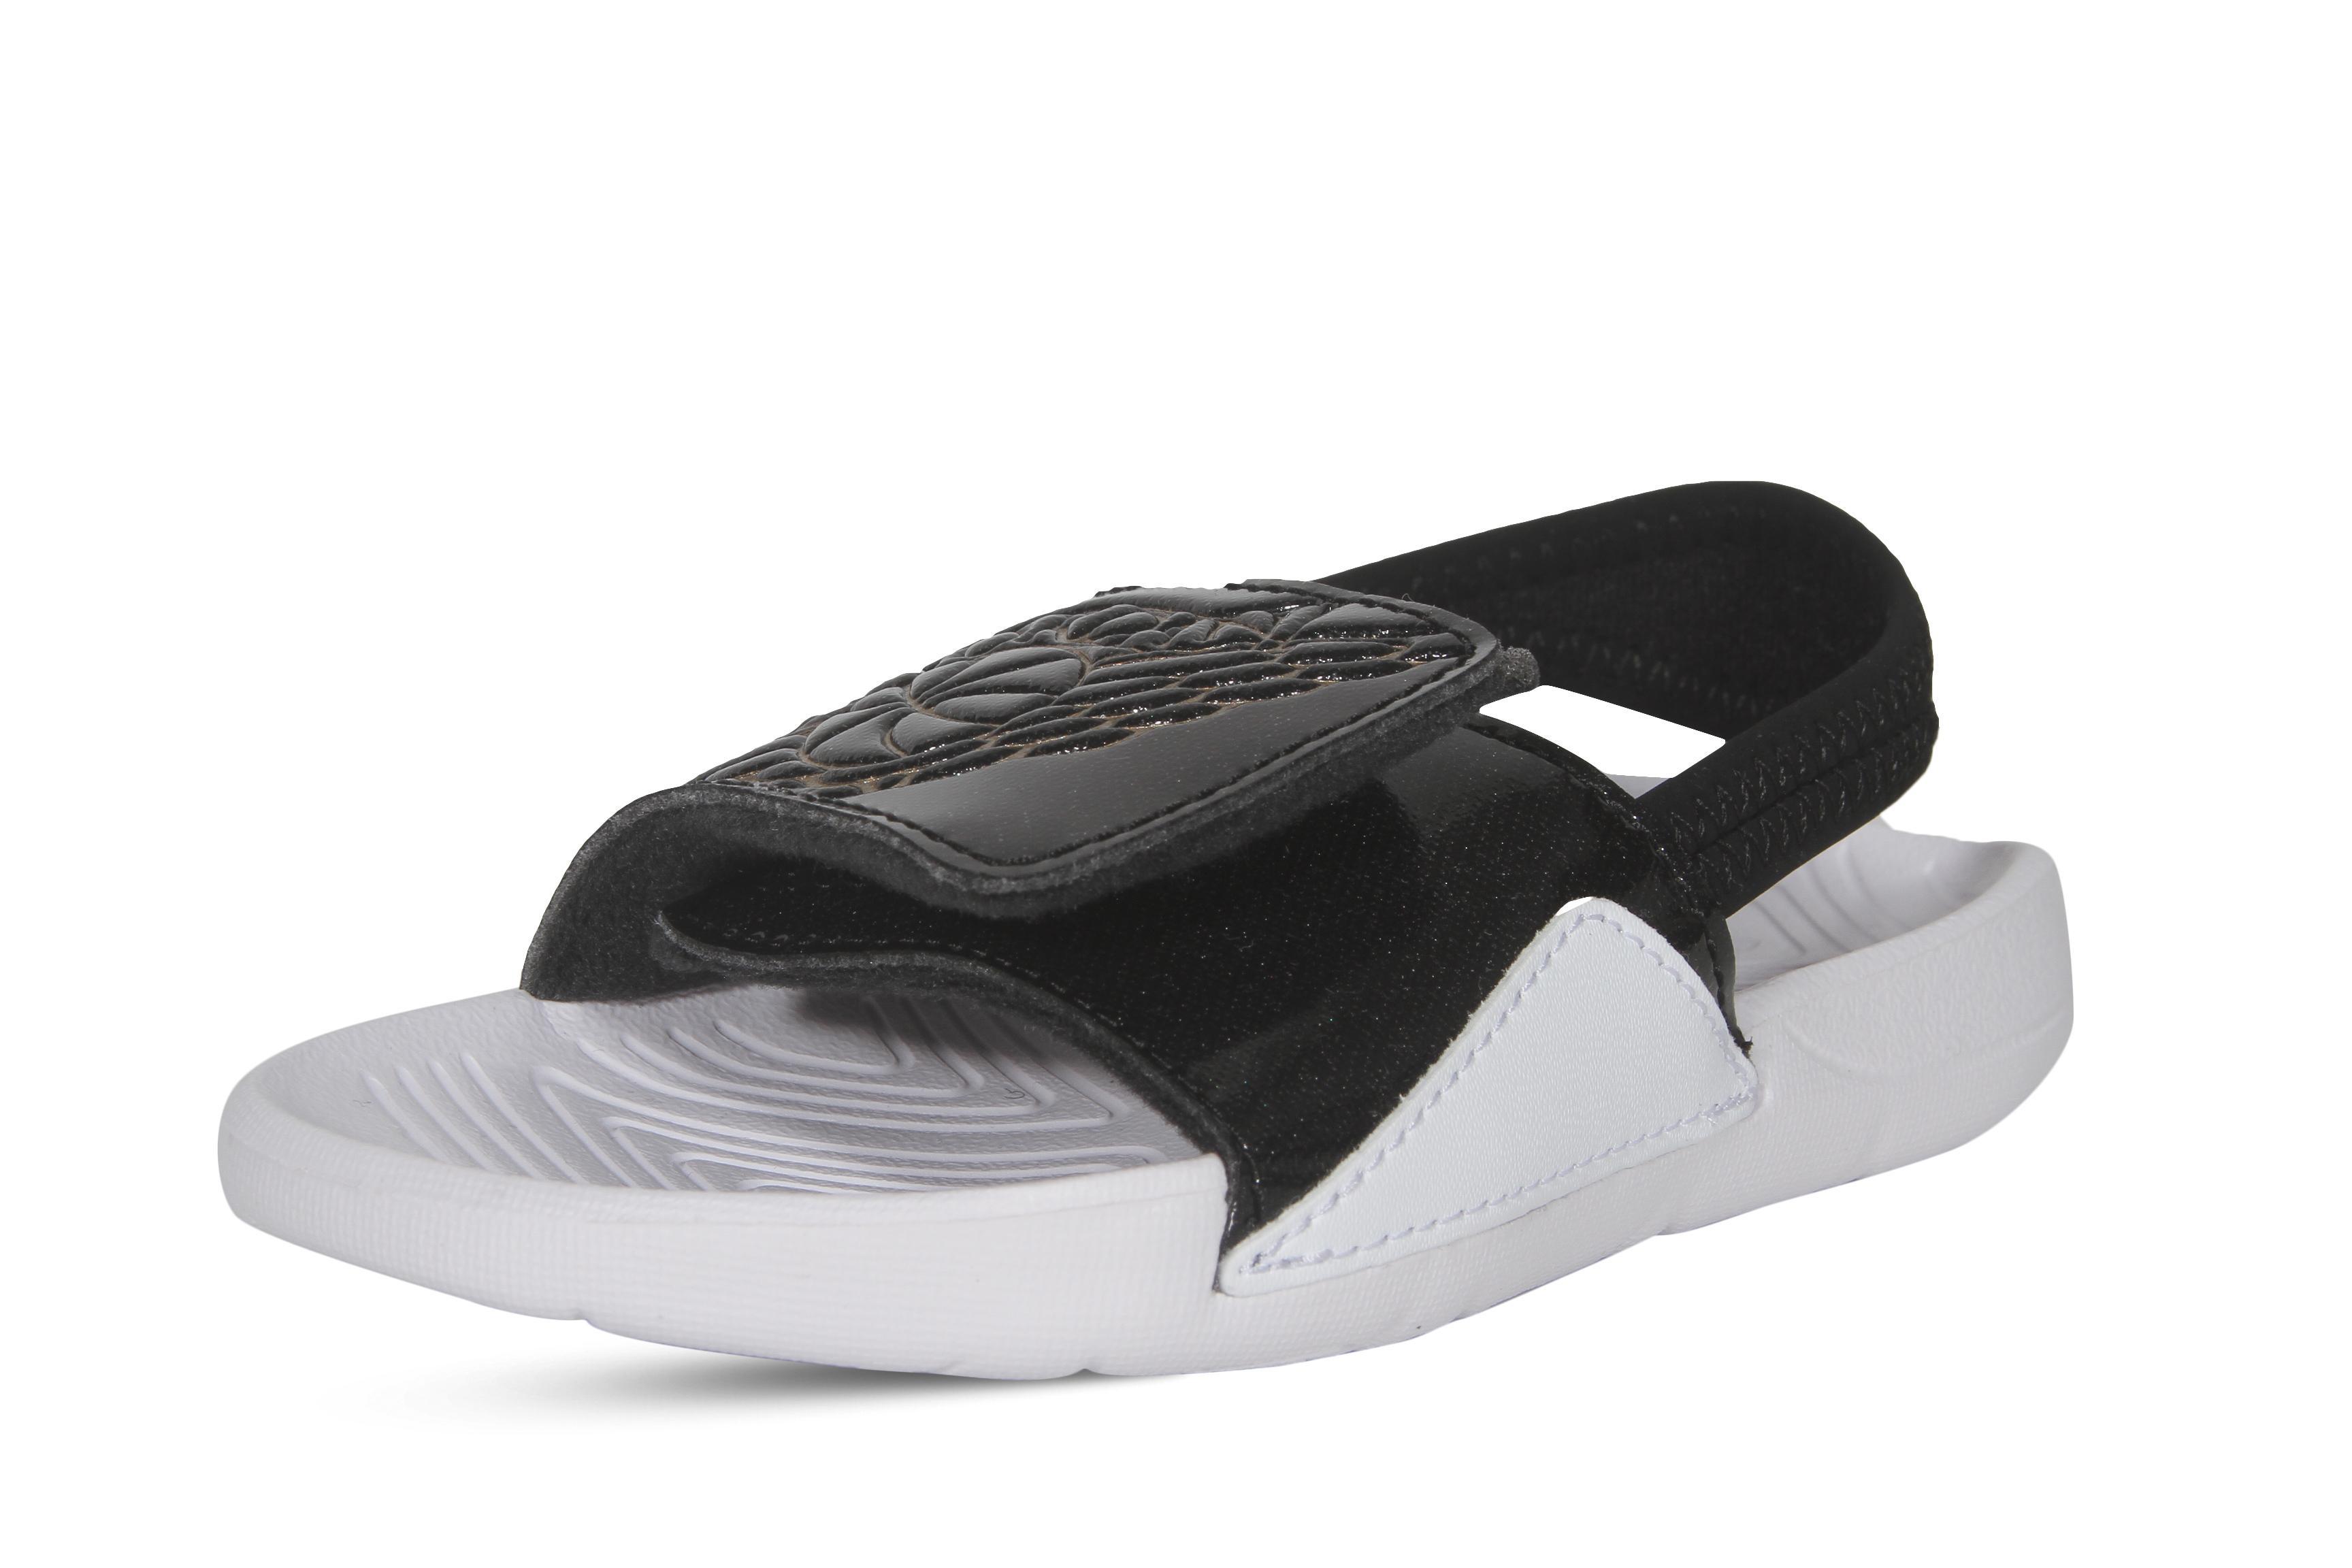 1c10b756f00677 Jordan Hydro 7 (TD) Slide Boys  Toddler Shoes AA2519-021